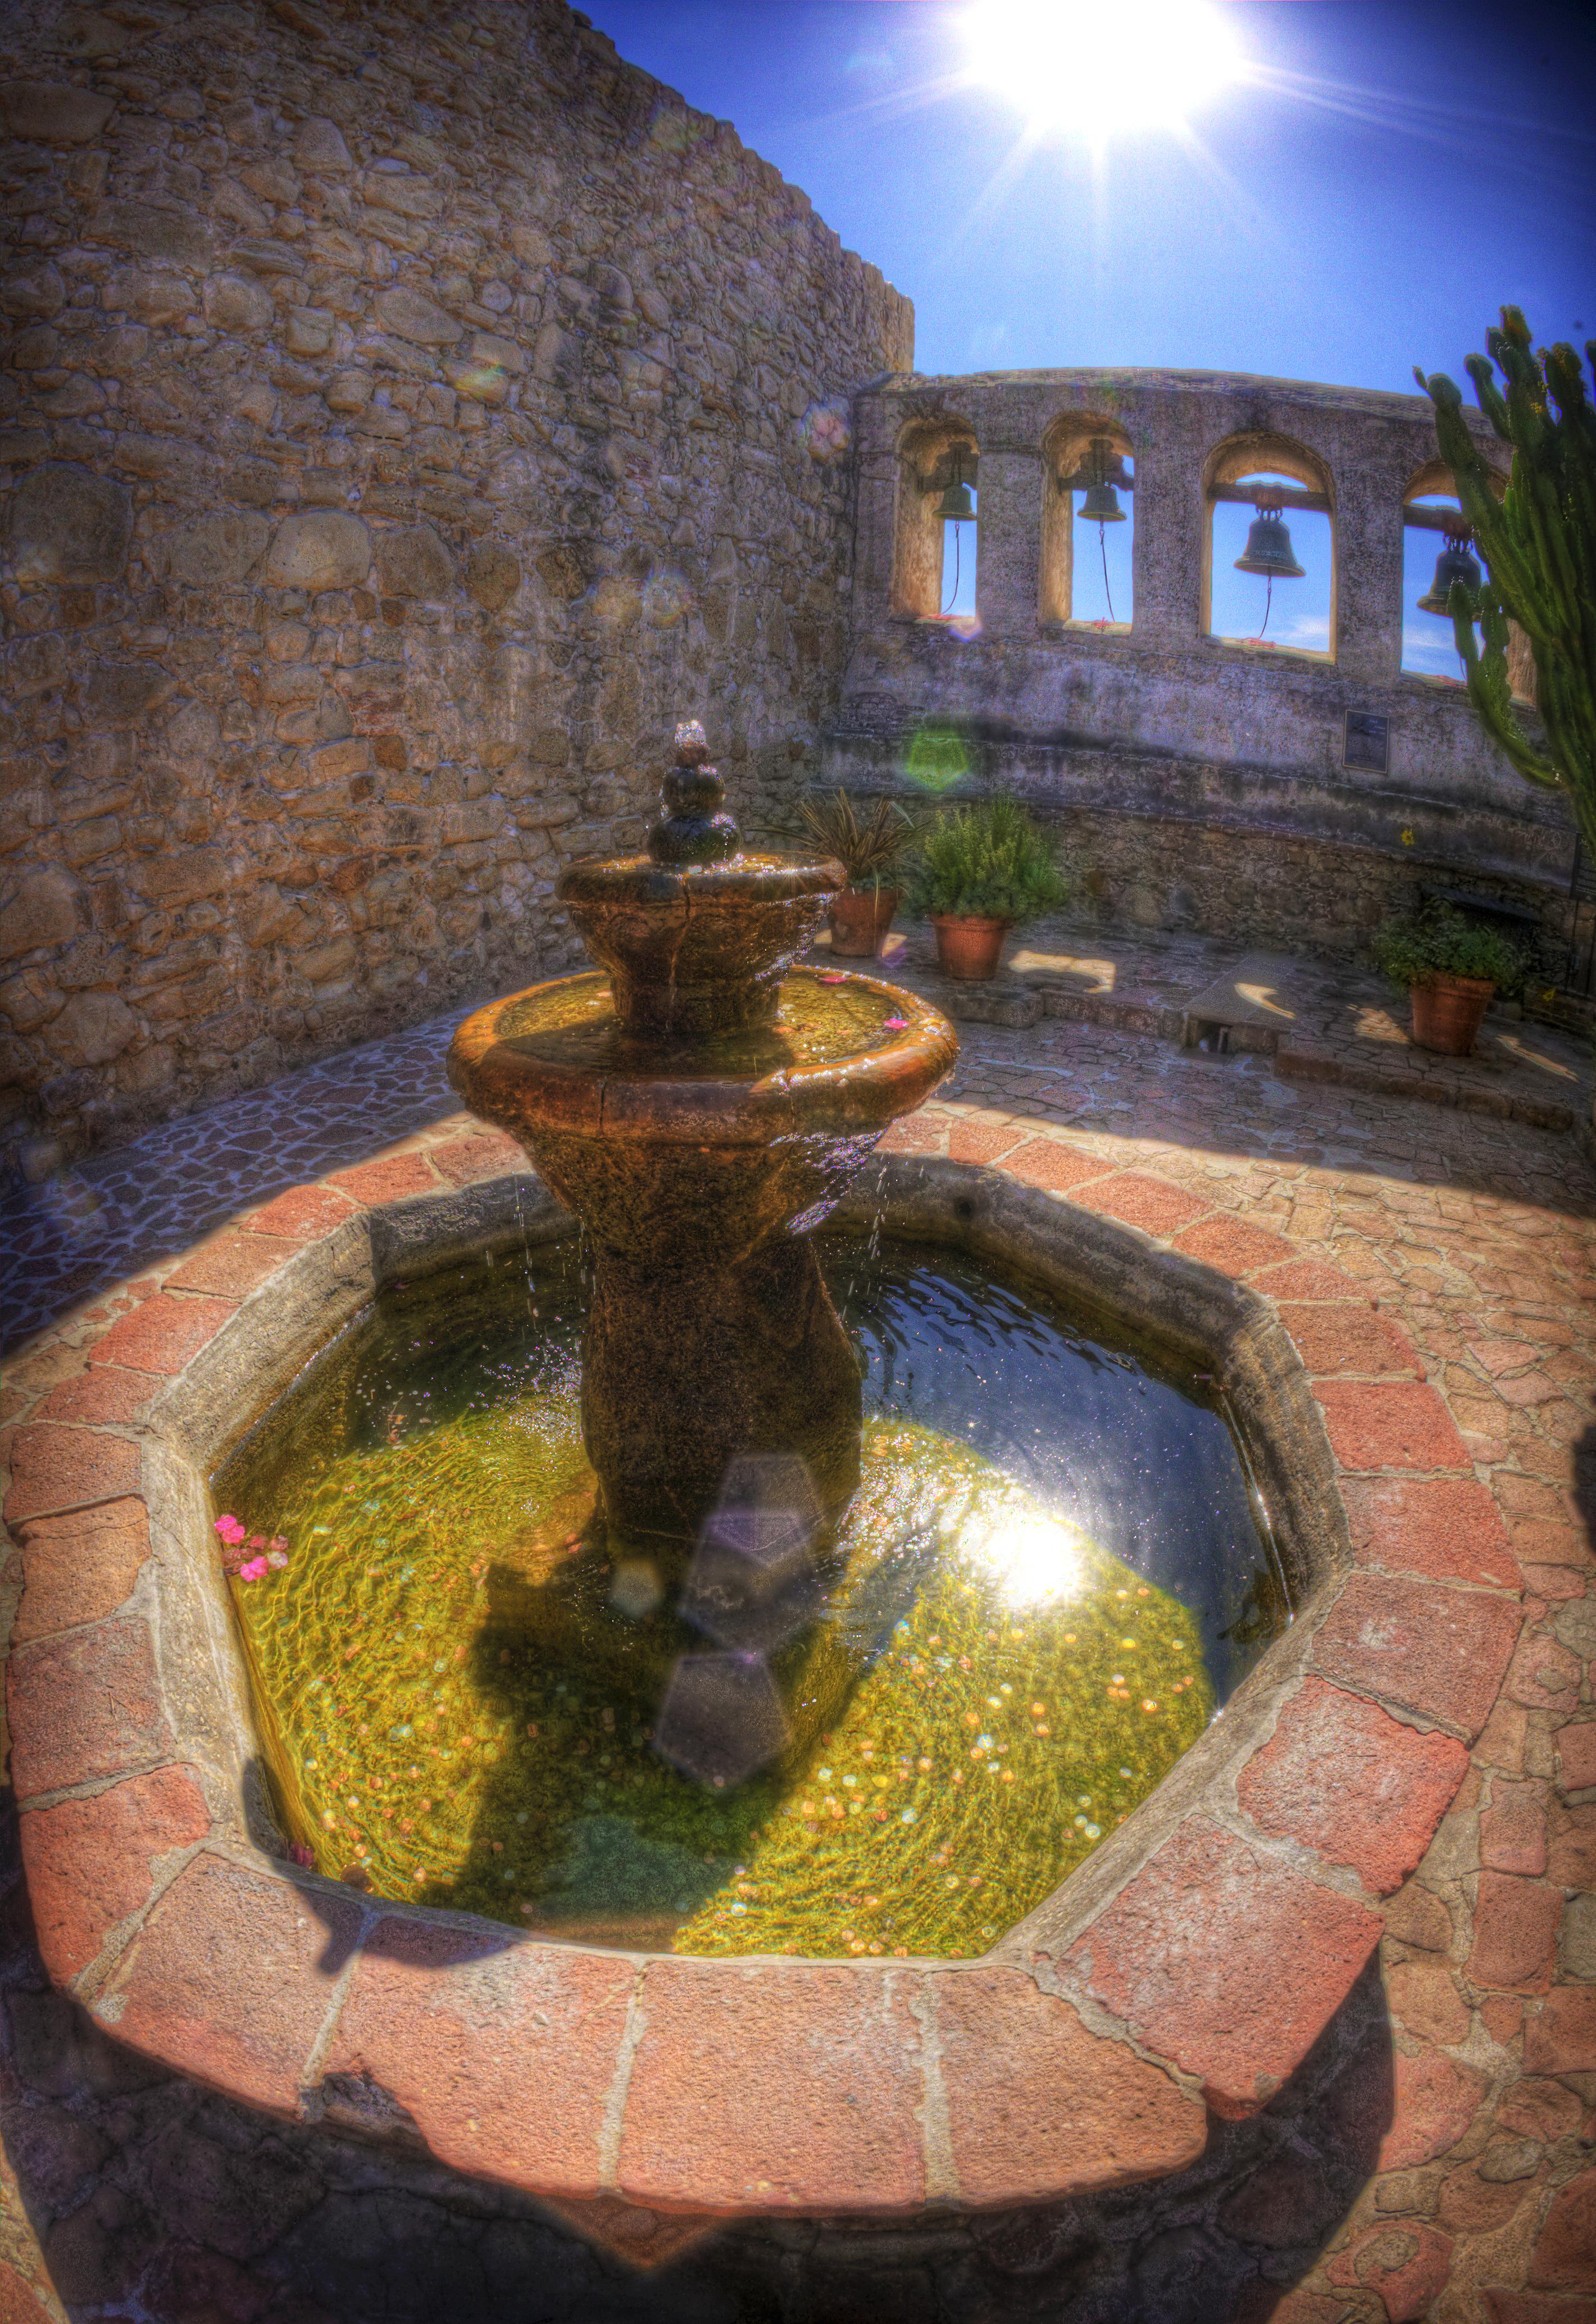 File:Mission San Juan Capistrano Sacred Garden.jpg - Wikimedia Commons